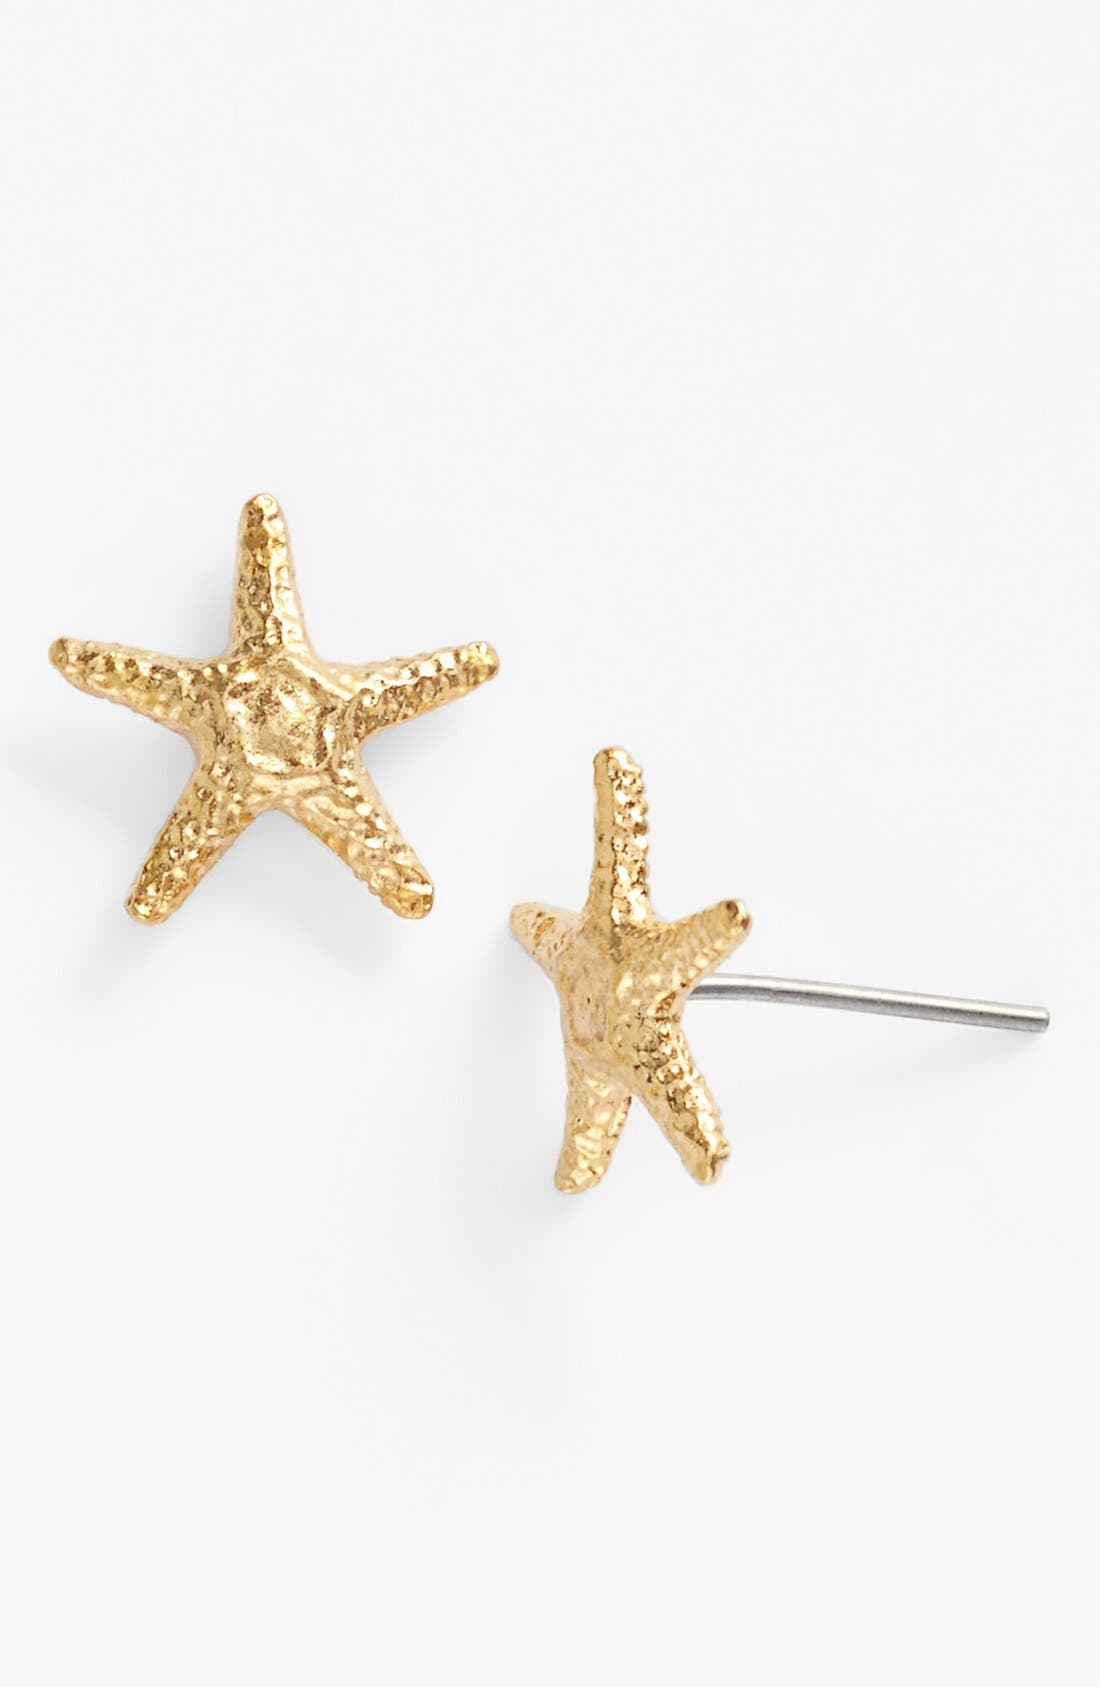 'Manini' Starfish Stud Earrings